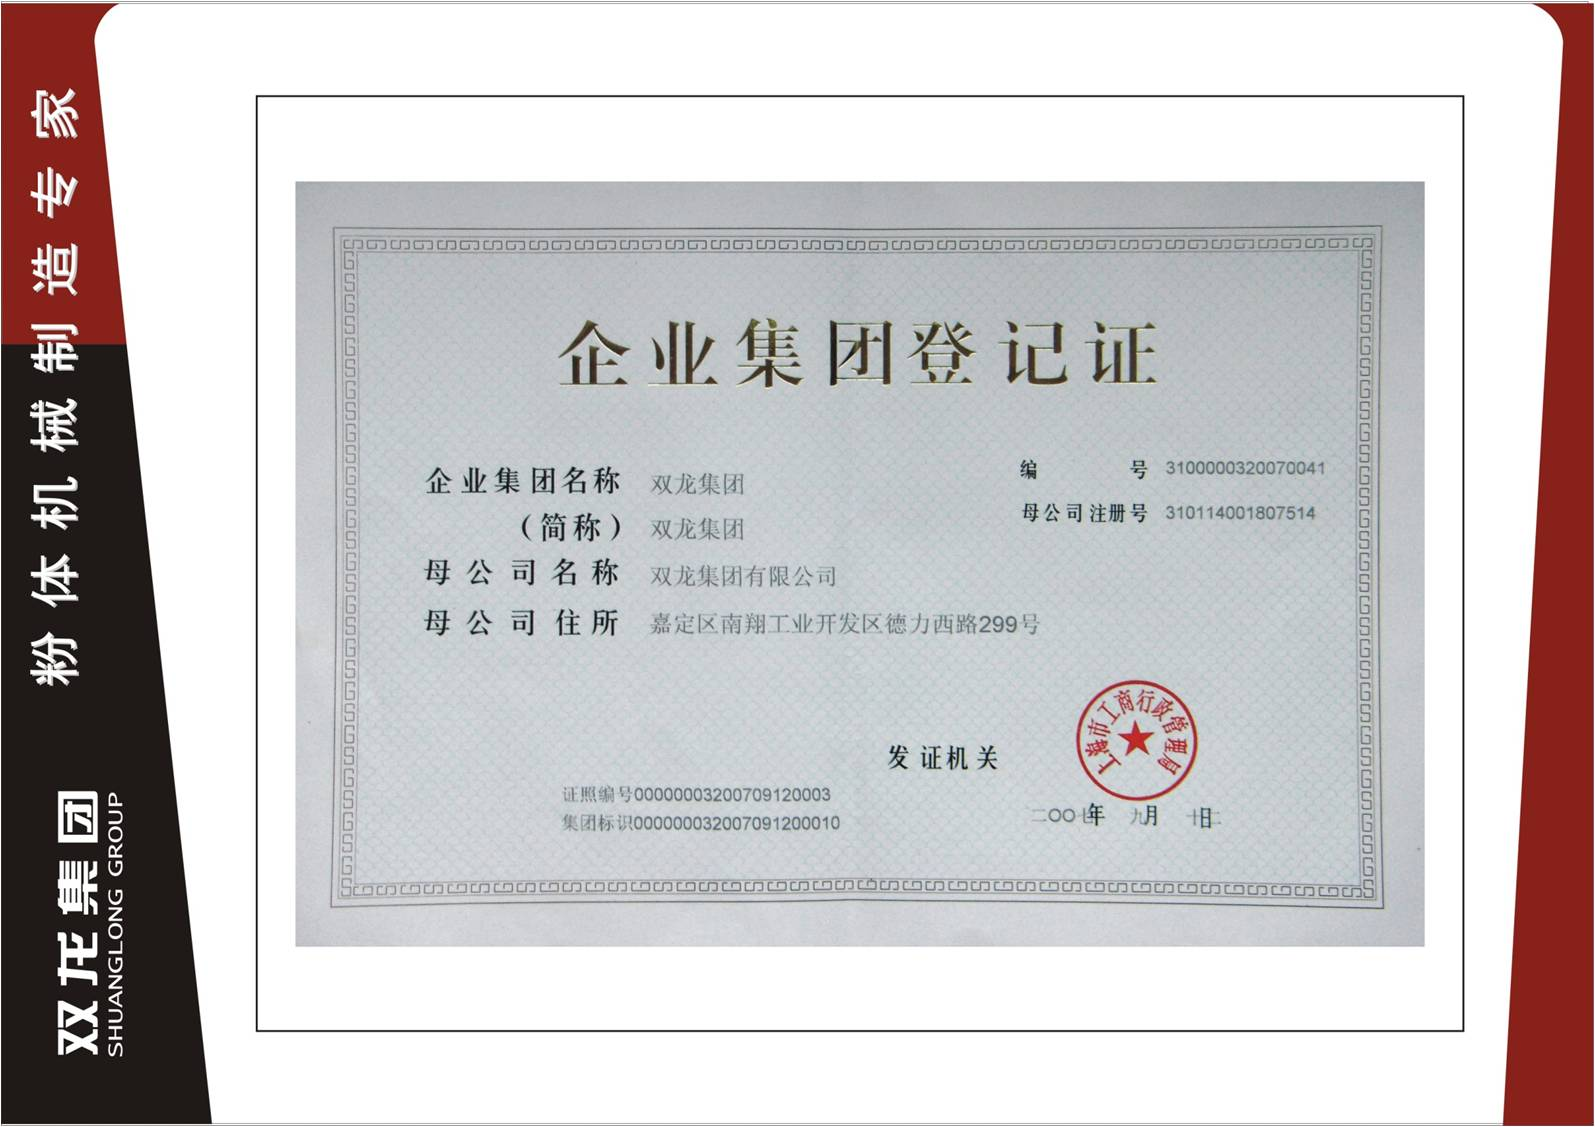 Enterprise Group Registration Certificate